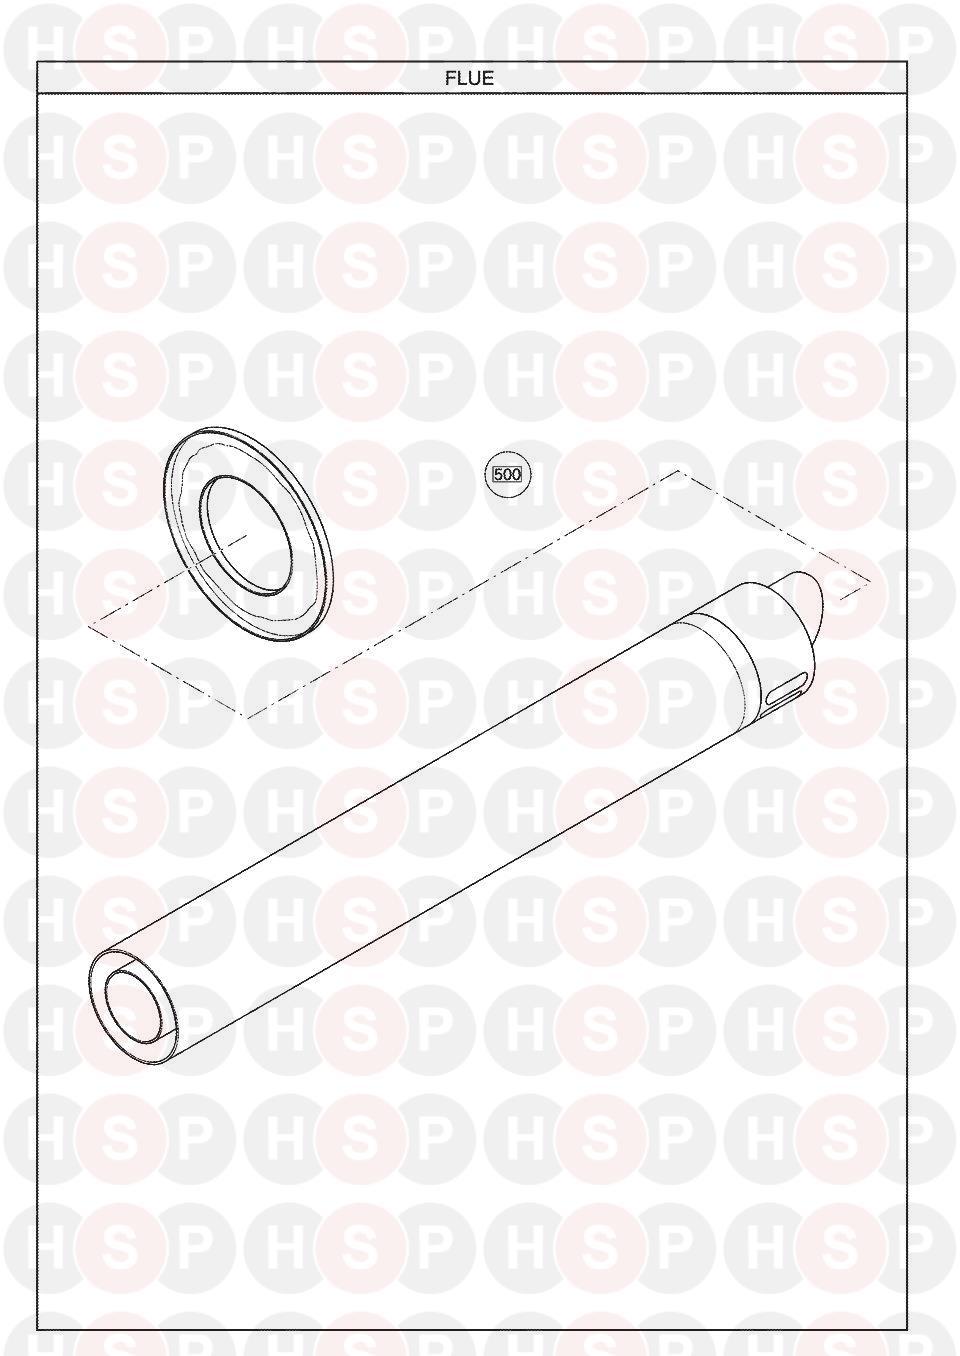 Potterton Suprima 50 He  Flue Diagram